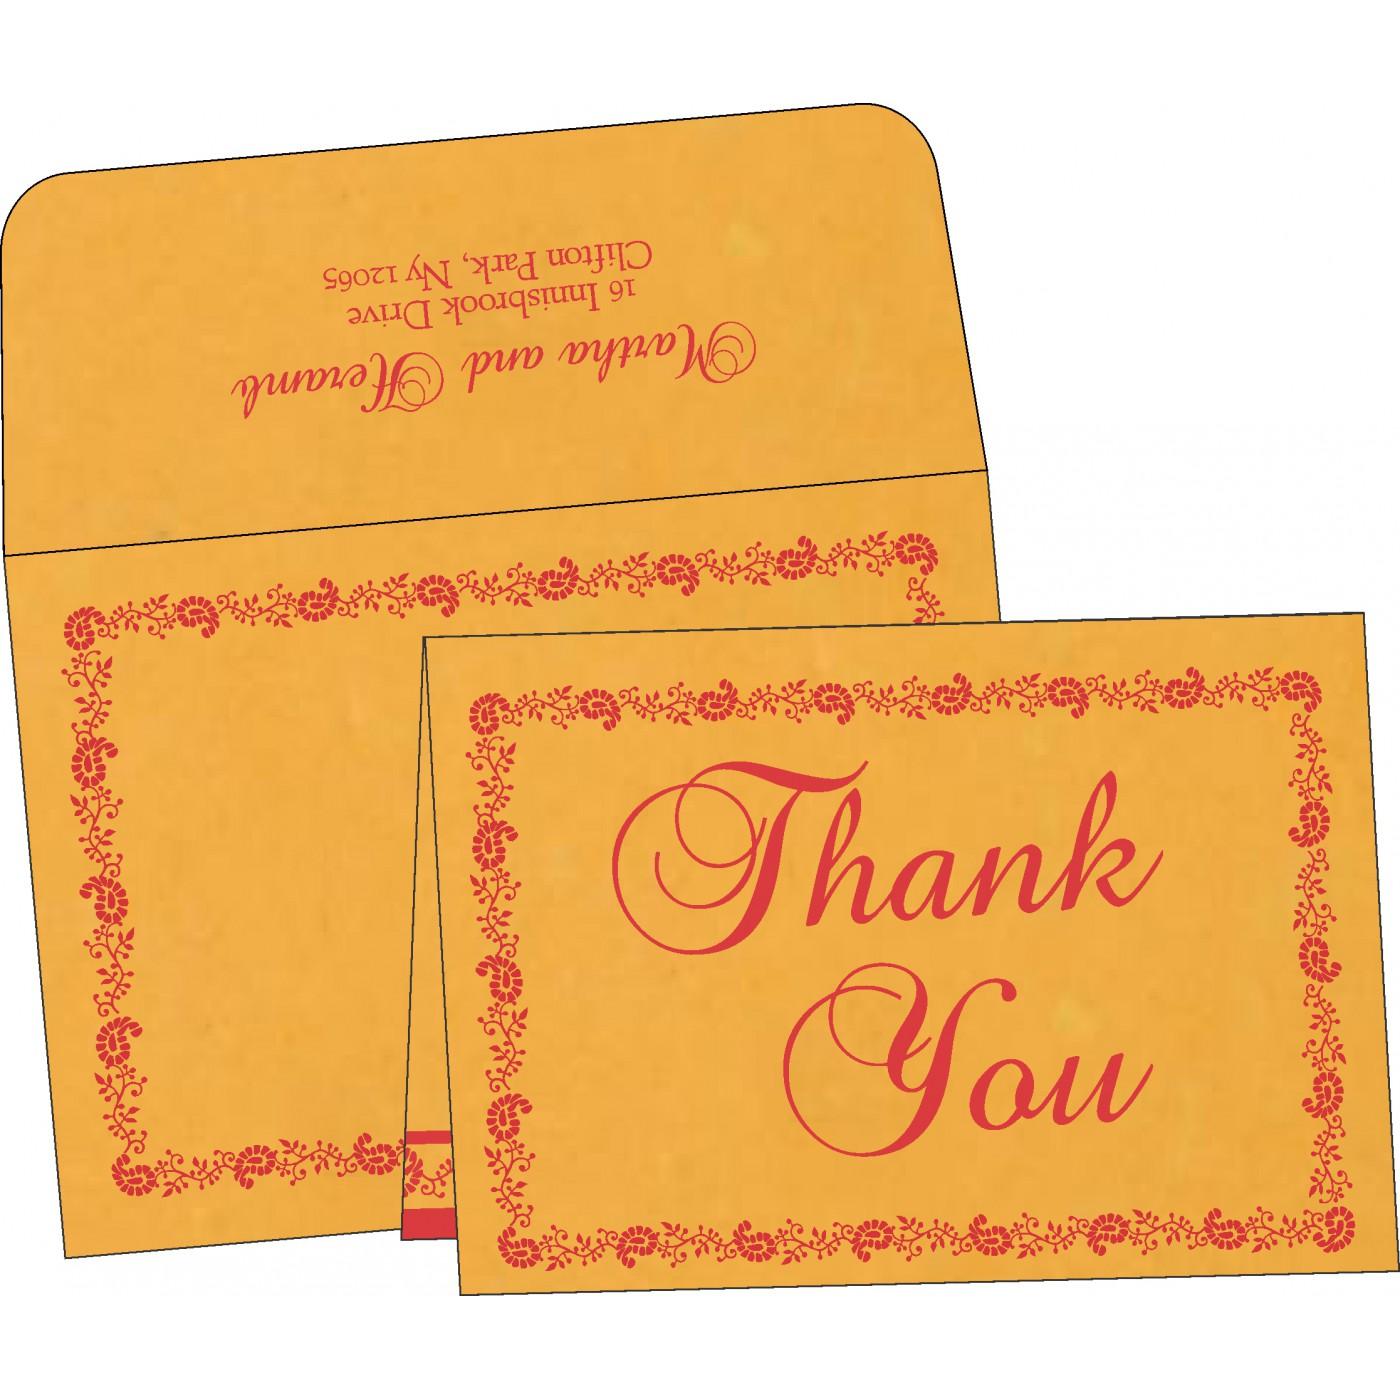 Thank You Cards : TYC-8208C - 123WeddingCards